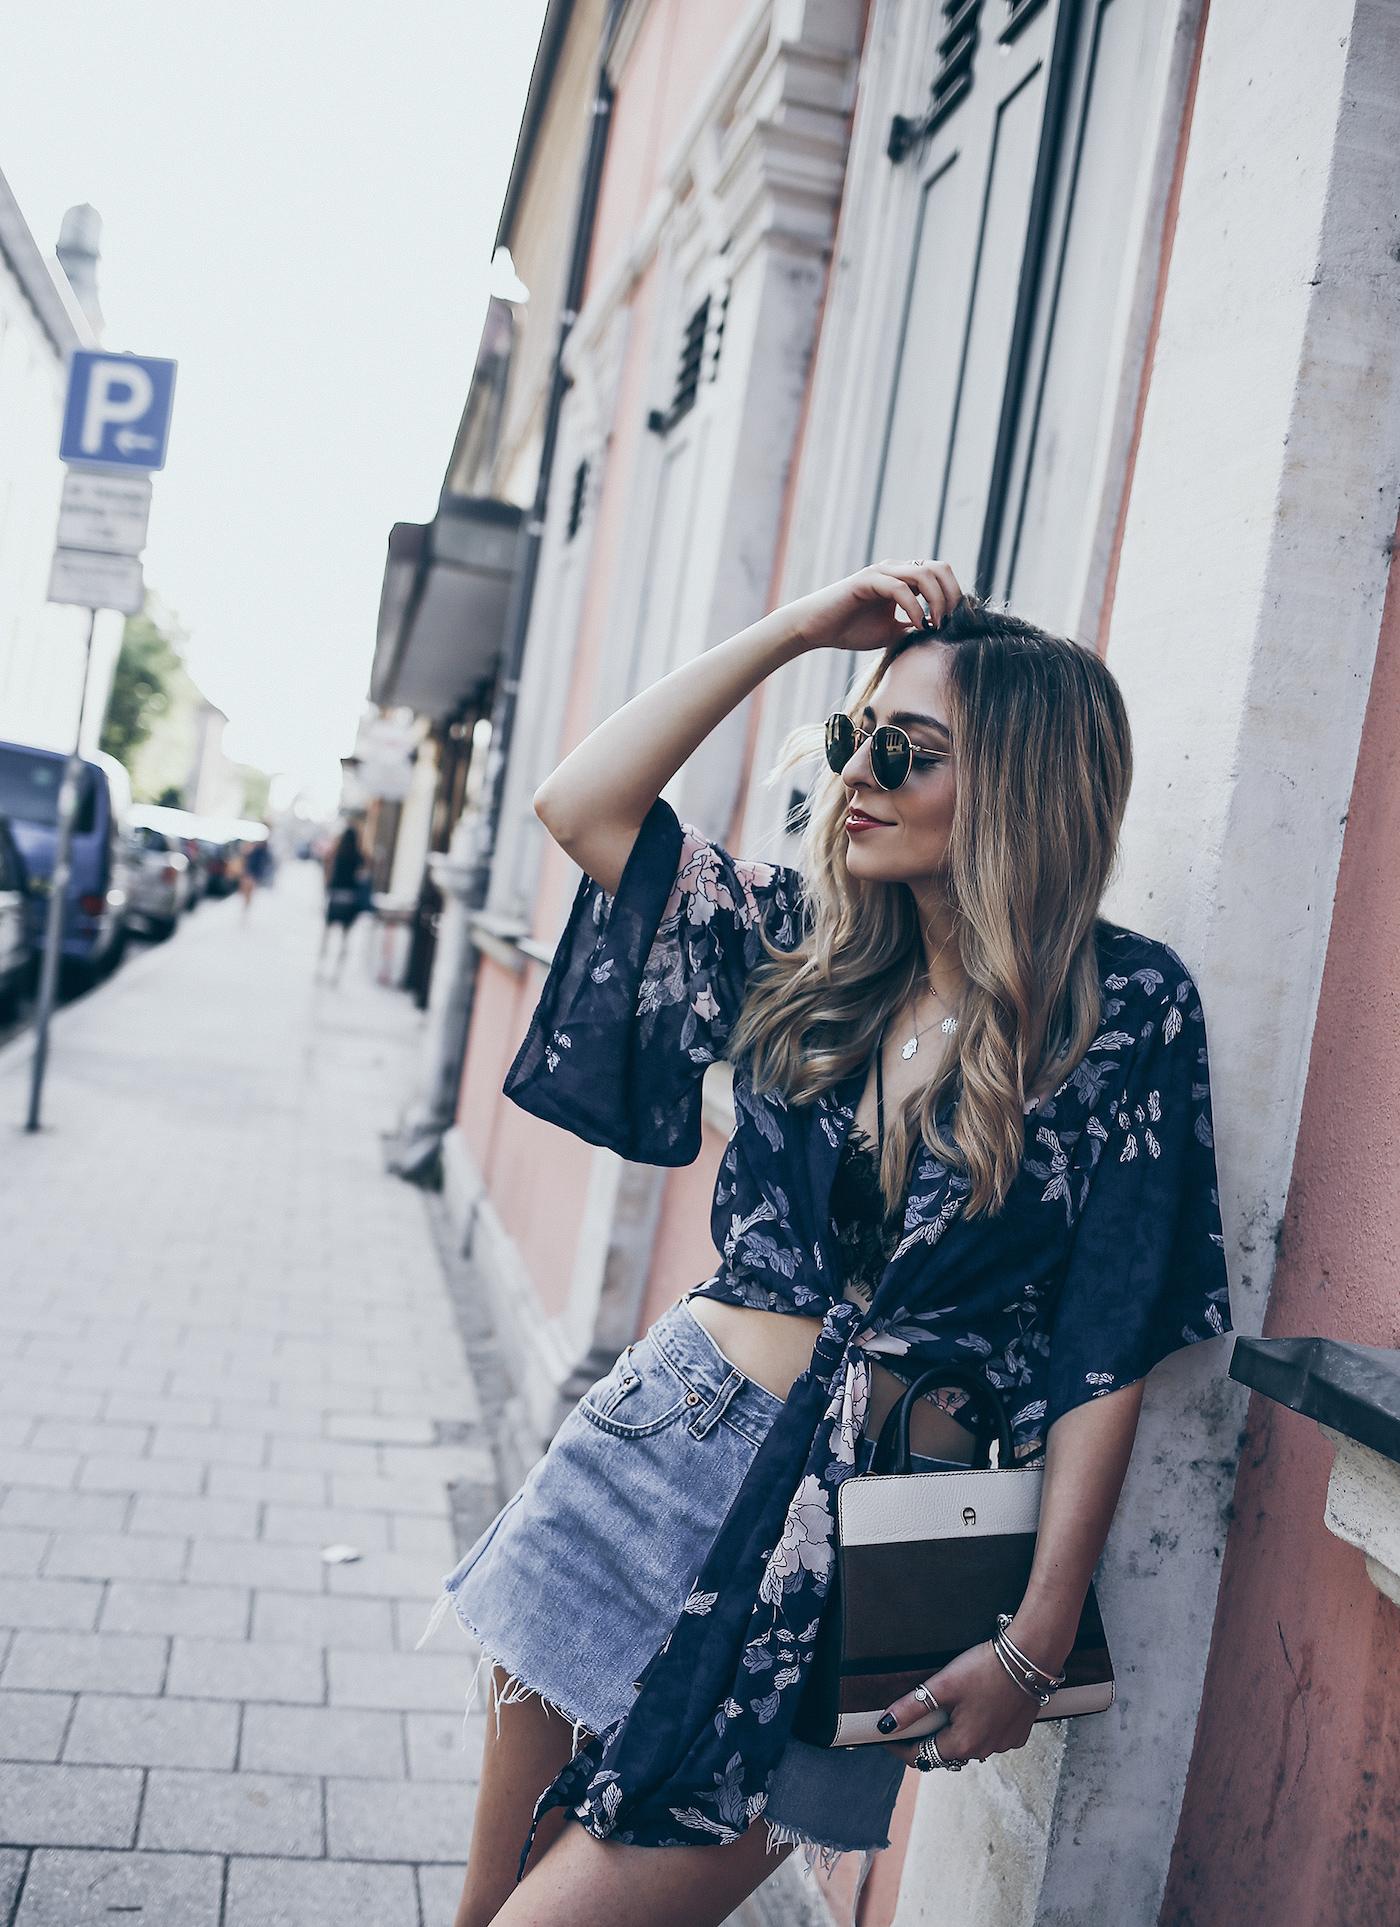 Non Technical Fashion Blog Photography Tips   Want Get Repeat Fashion Blog Mode Blog Nürnberg Erlangen